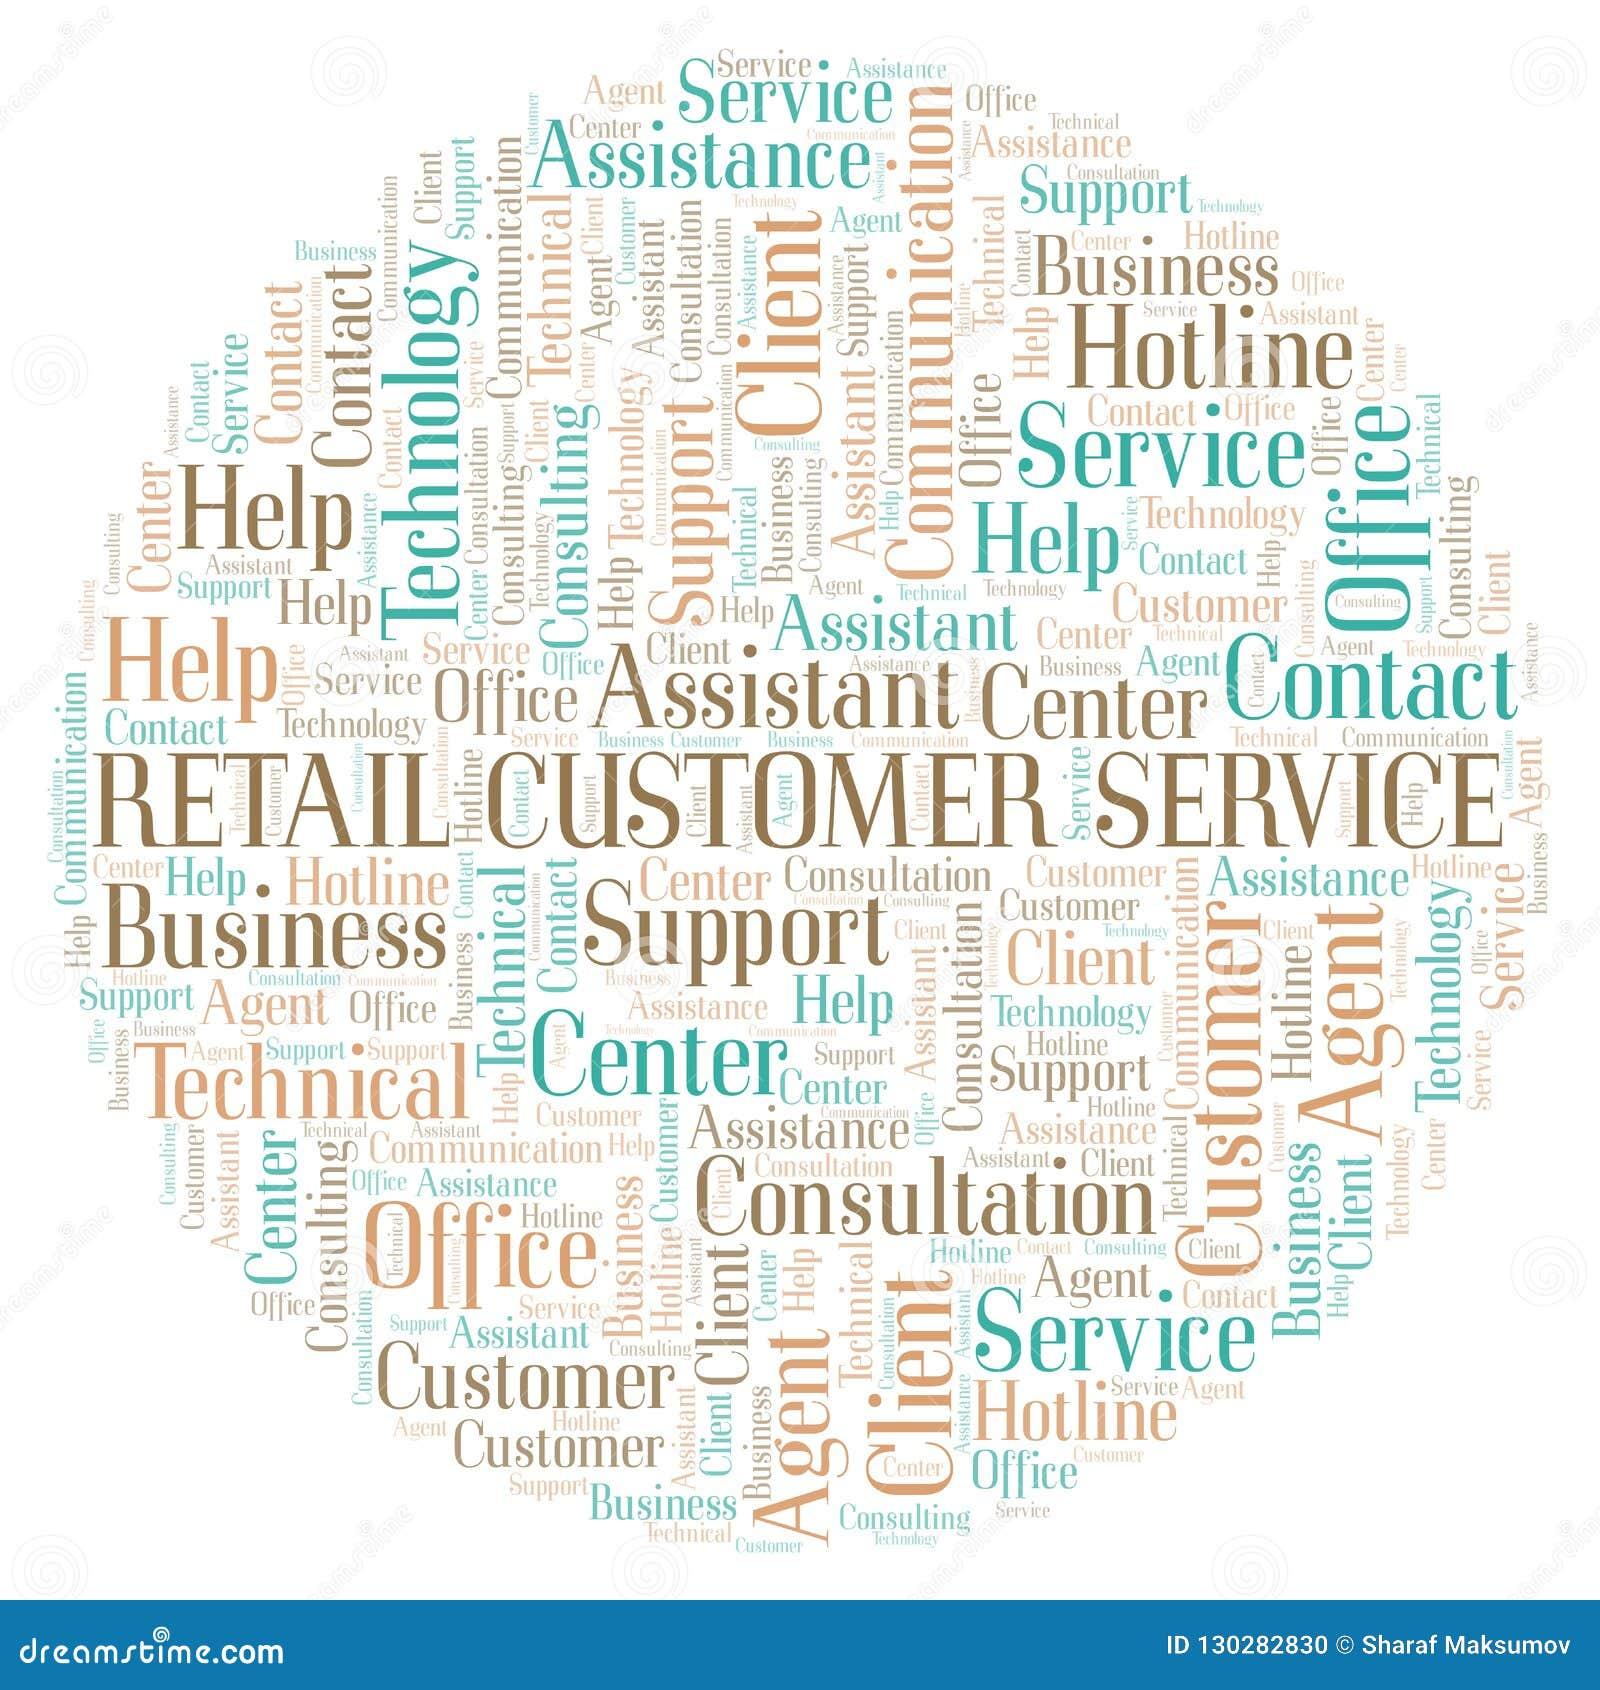 Retail Customer Service Word Cloud  Stock Illustration